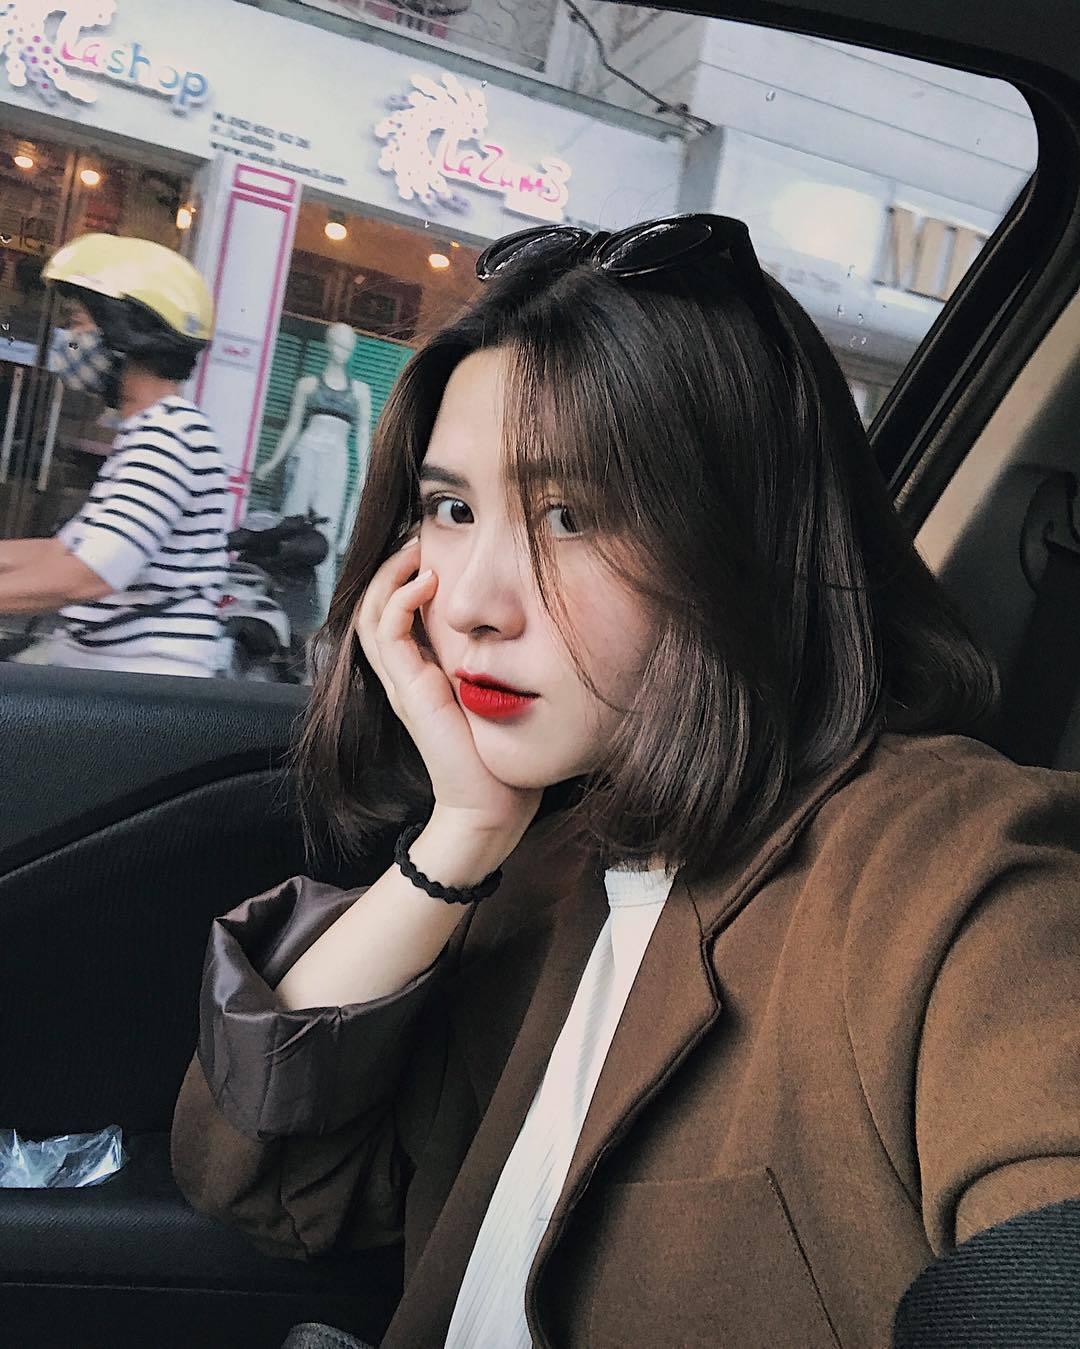 uon-cup-duoi-nhung-kieu-toc-ngang-vai-dep-cho-co-nang-luoi-bieng-copy